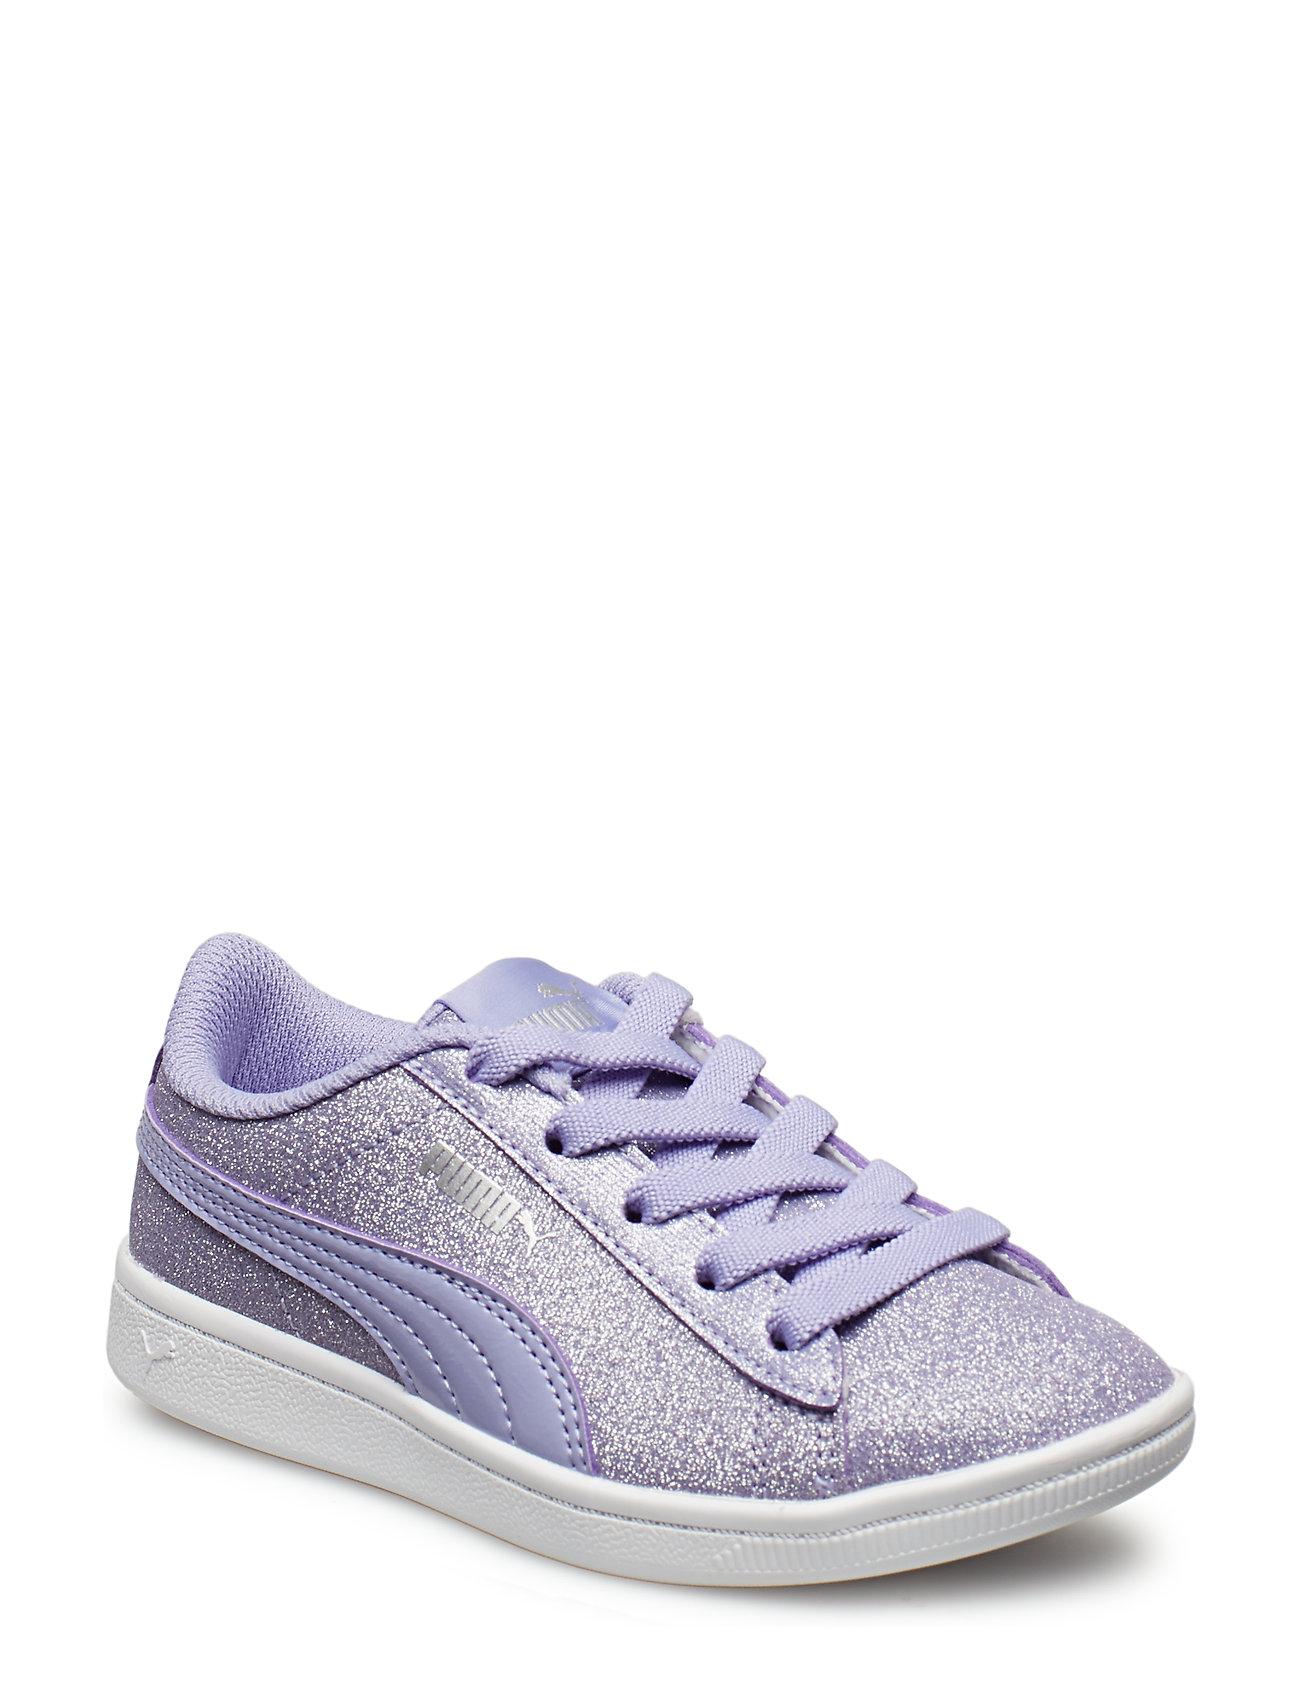 ab2a74718 Puma Vikky Glitz Ac Ps (Sweet Lavender-sweet Lavender) (£33) - PUMA ...